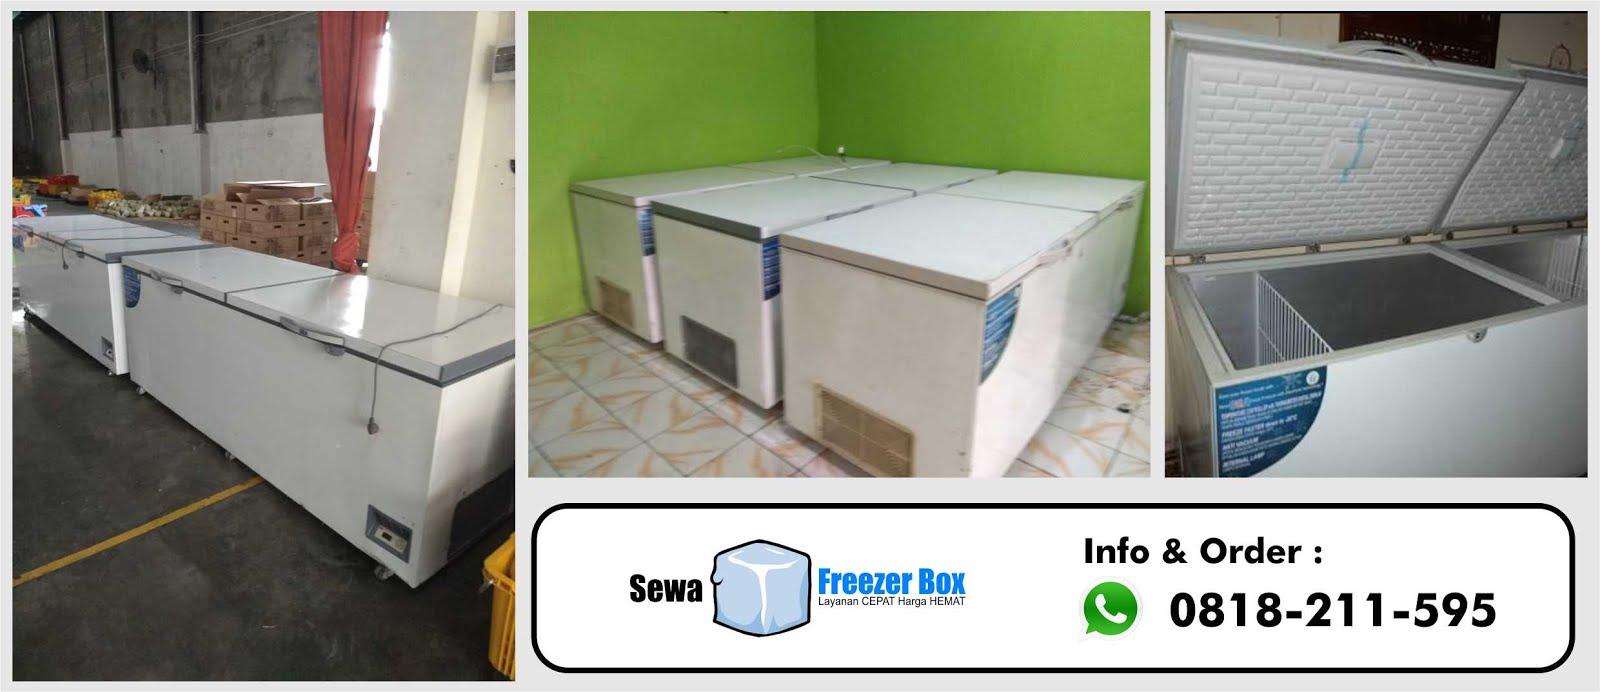 sewa freezer box 1000 liter - sewafreezerbox.com